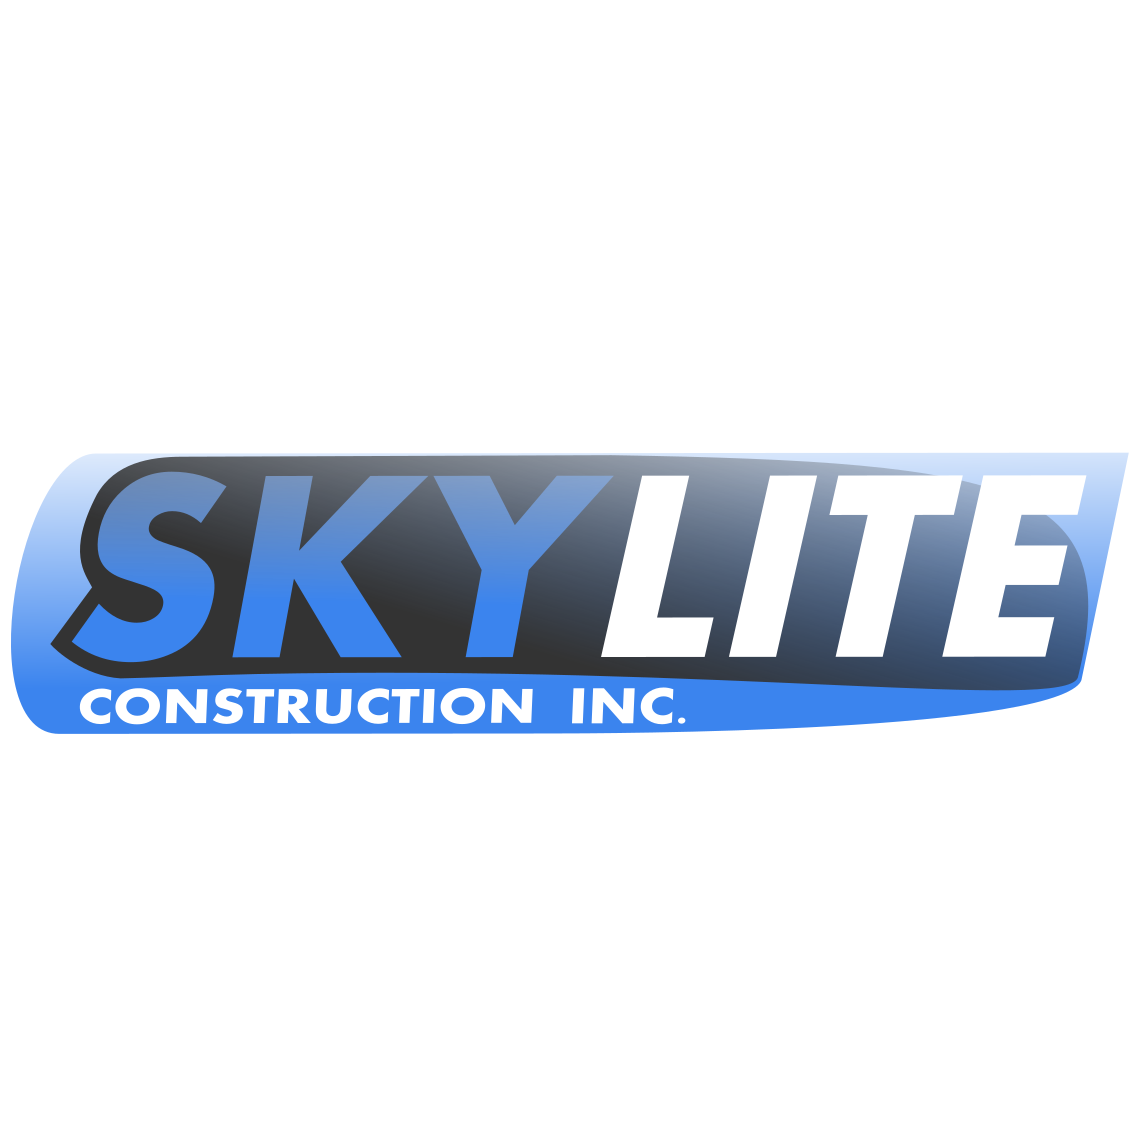 Skylite Construction